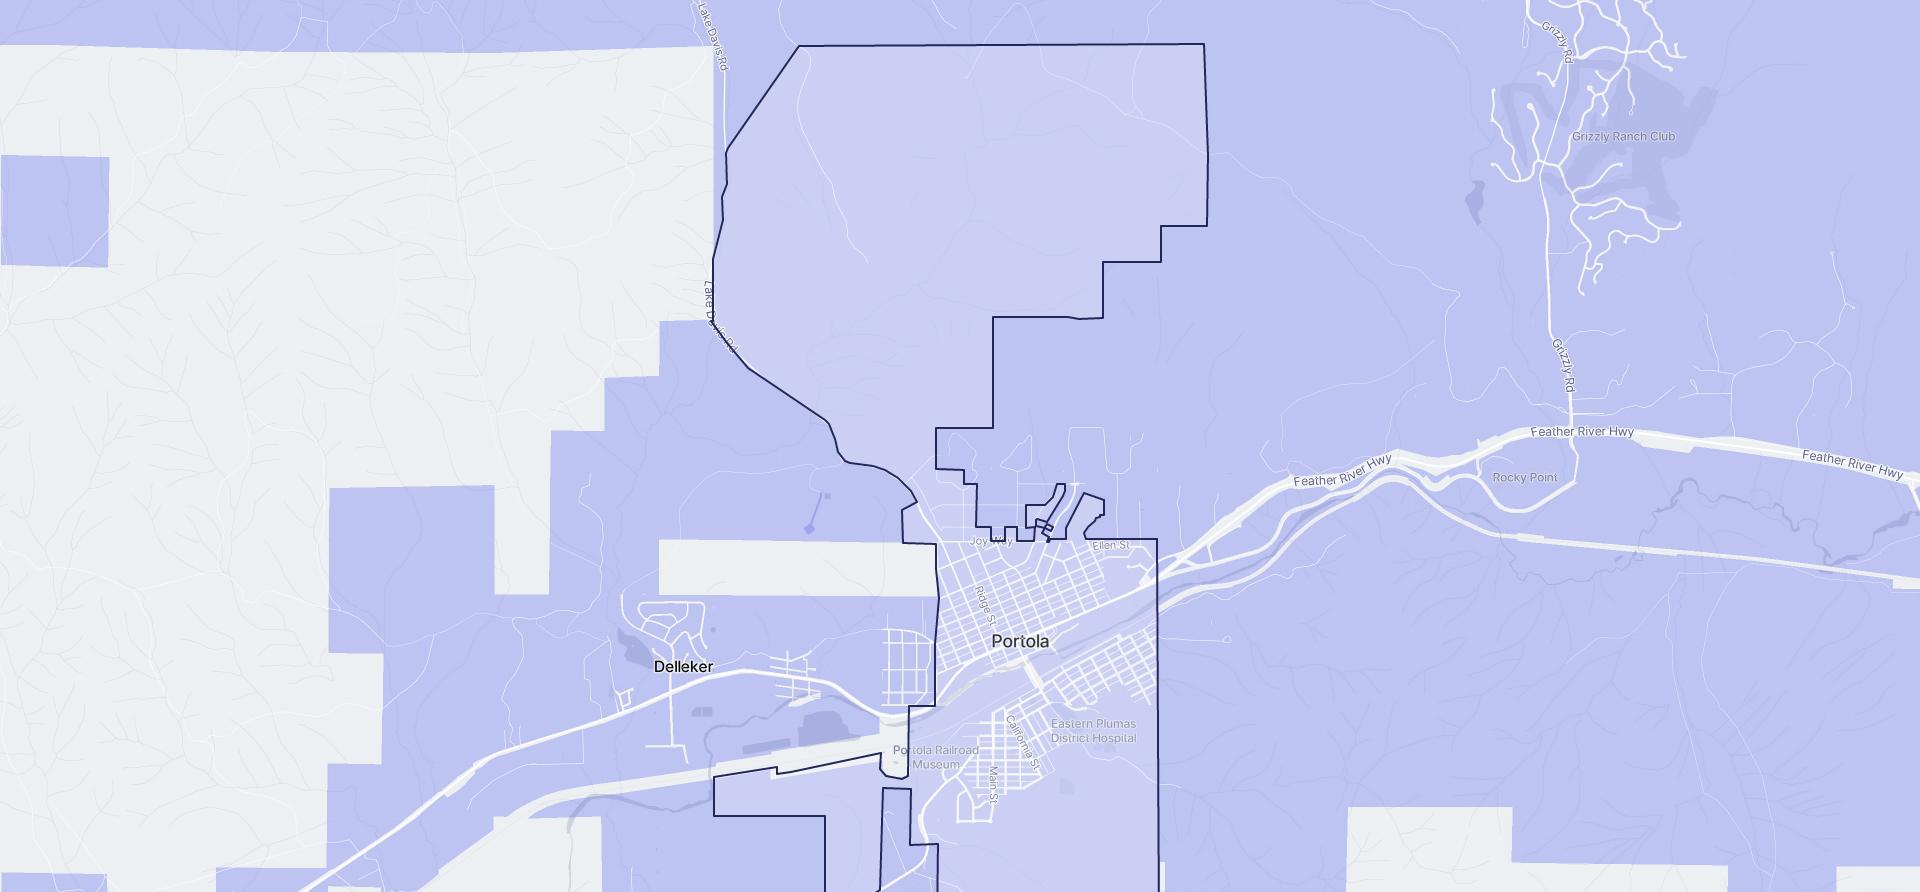 Image of Portola boundaries on a map.